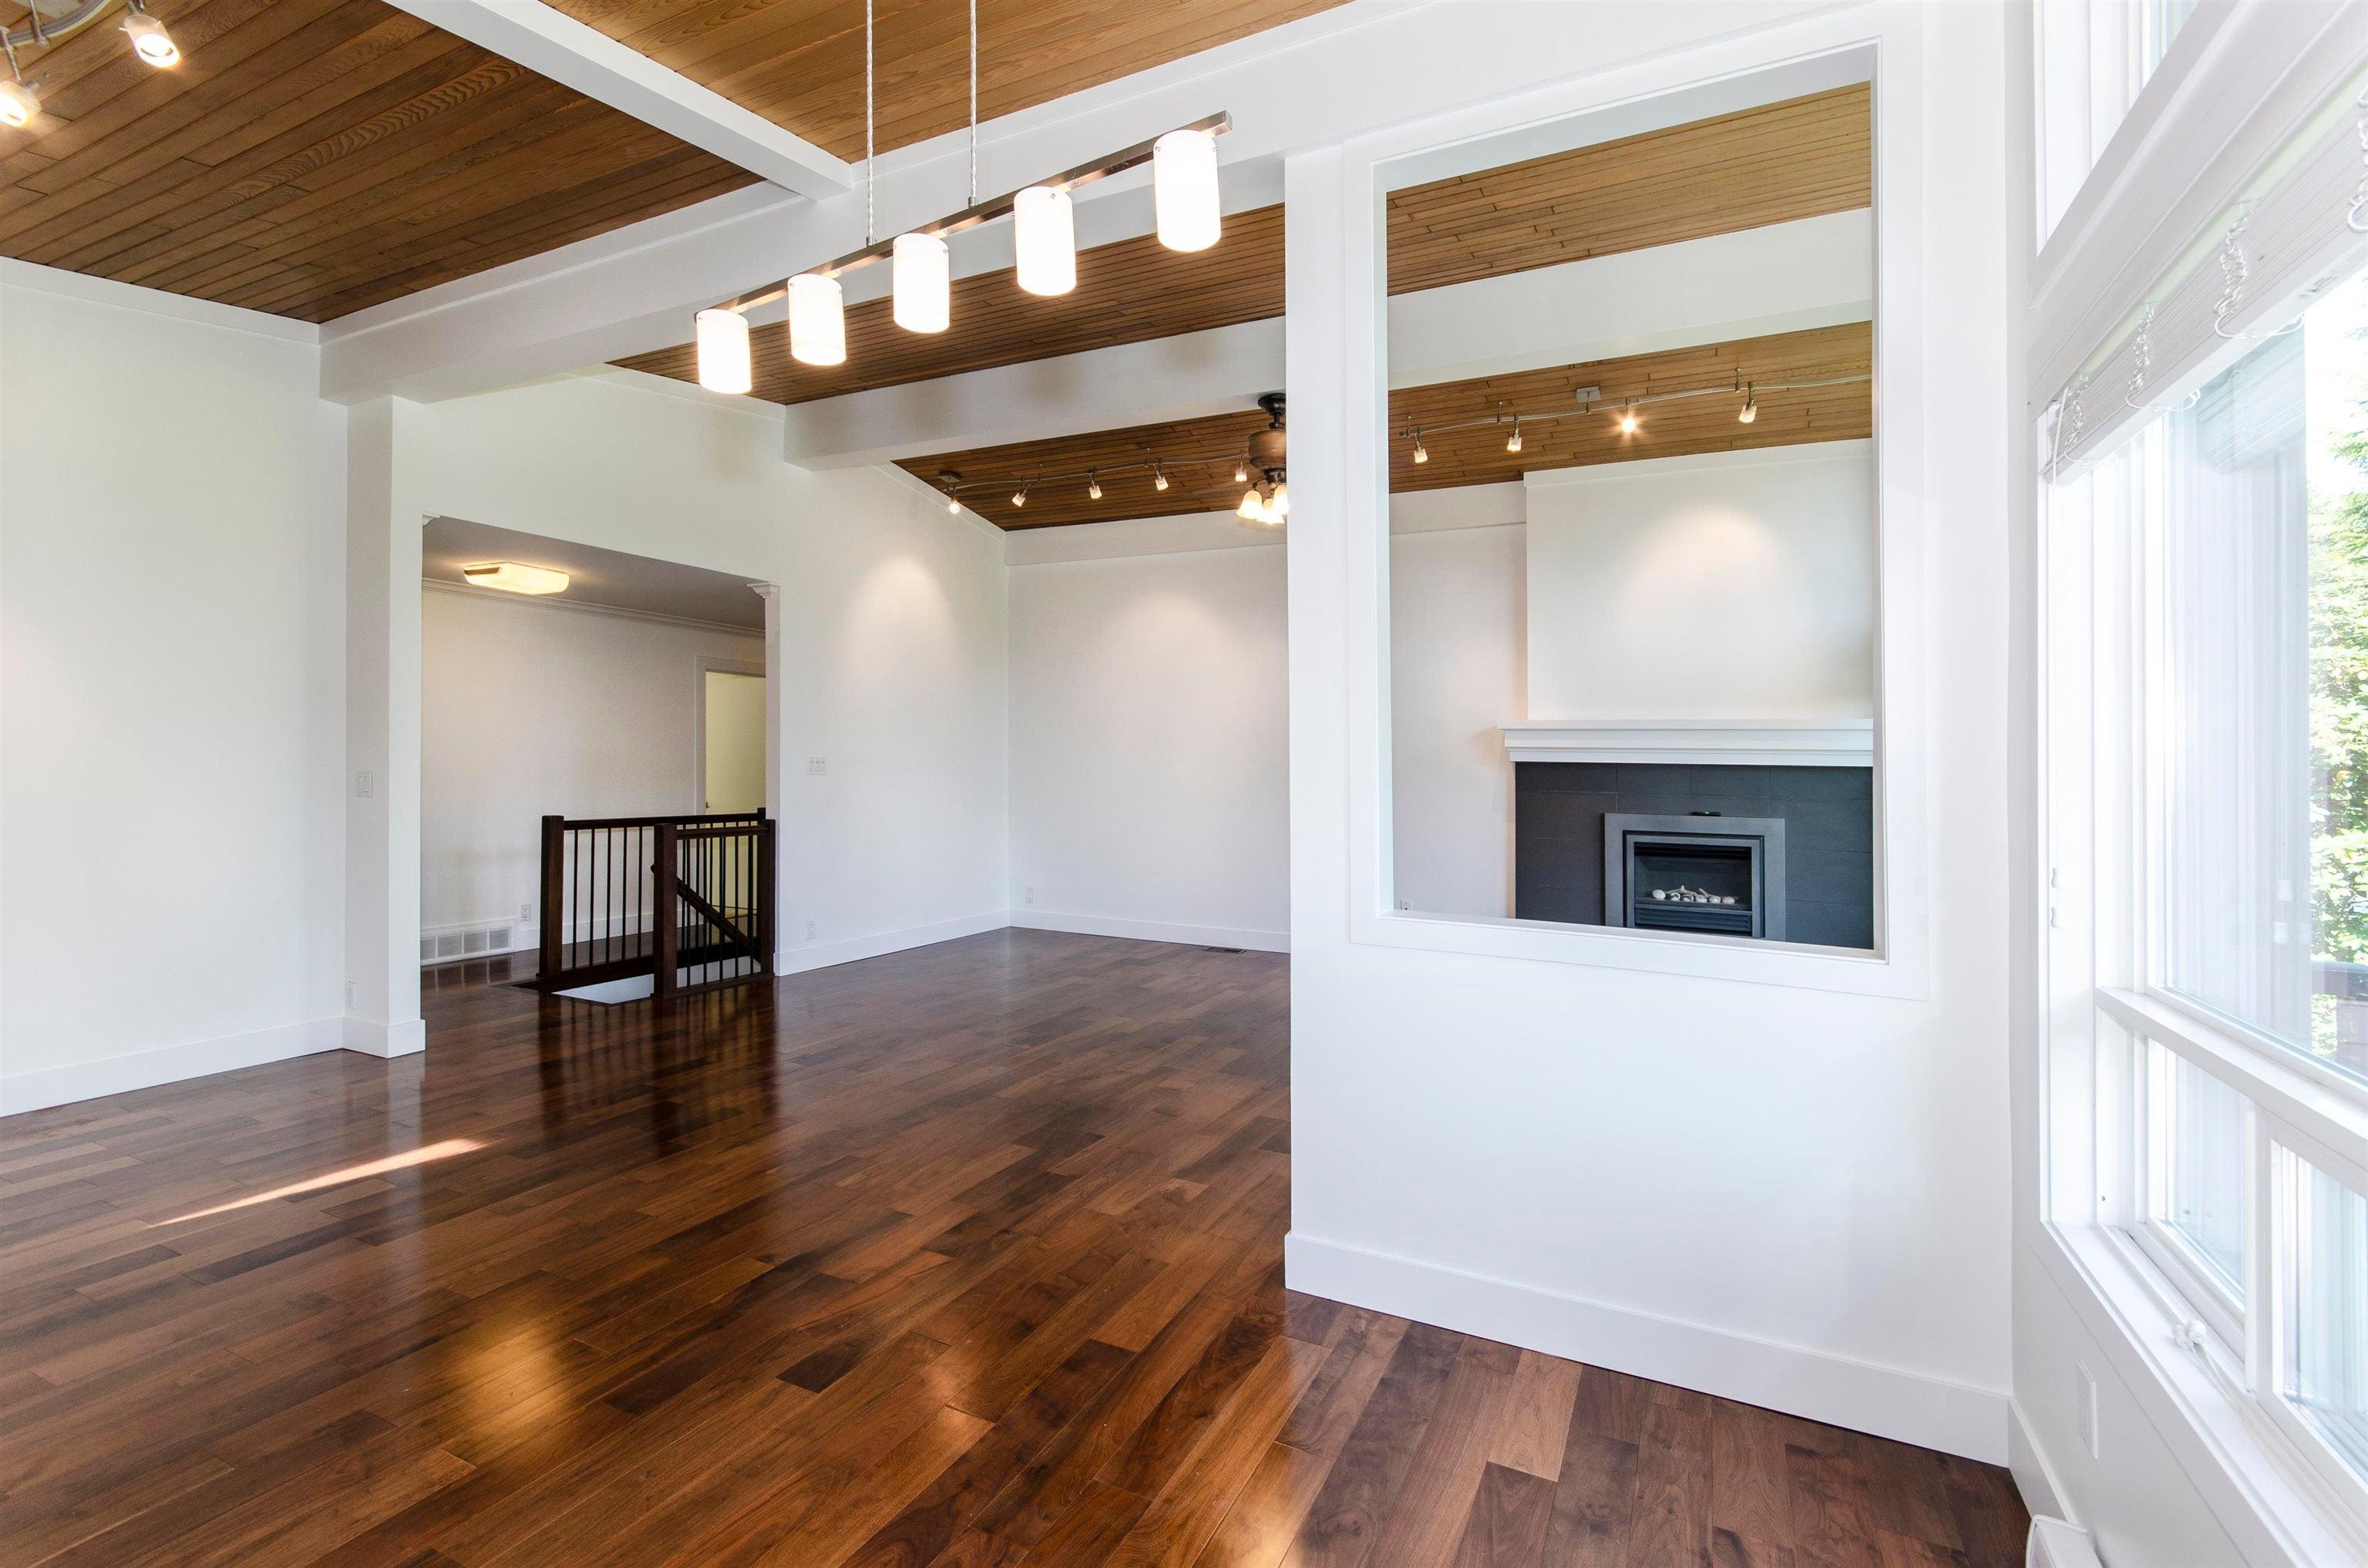 3785 REGENT AVENUE - Upper Lonsdale House/Single Family for sale, 4 Bedrooms (R2617648) - #6